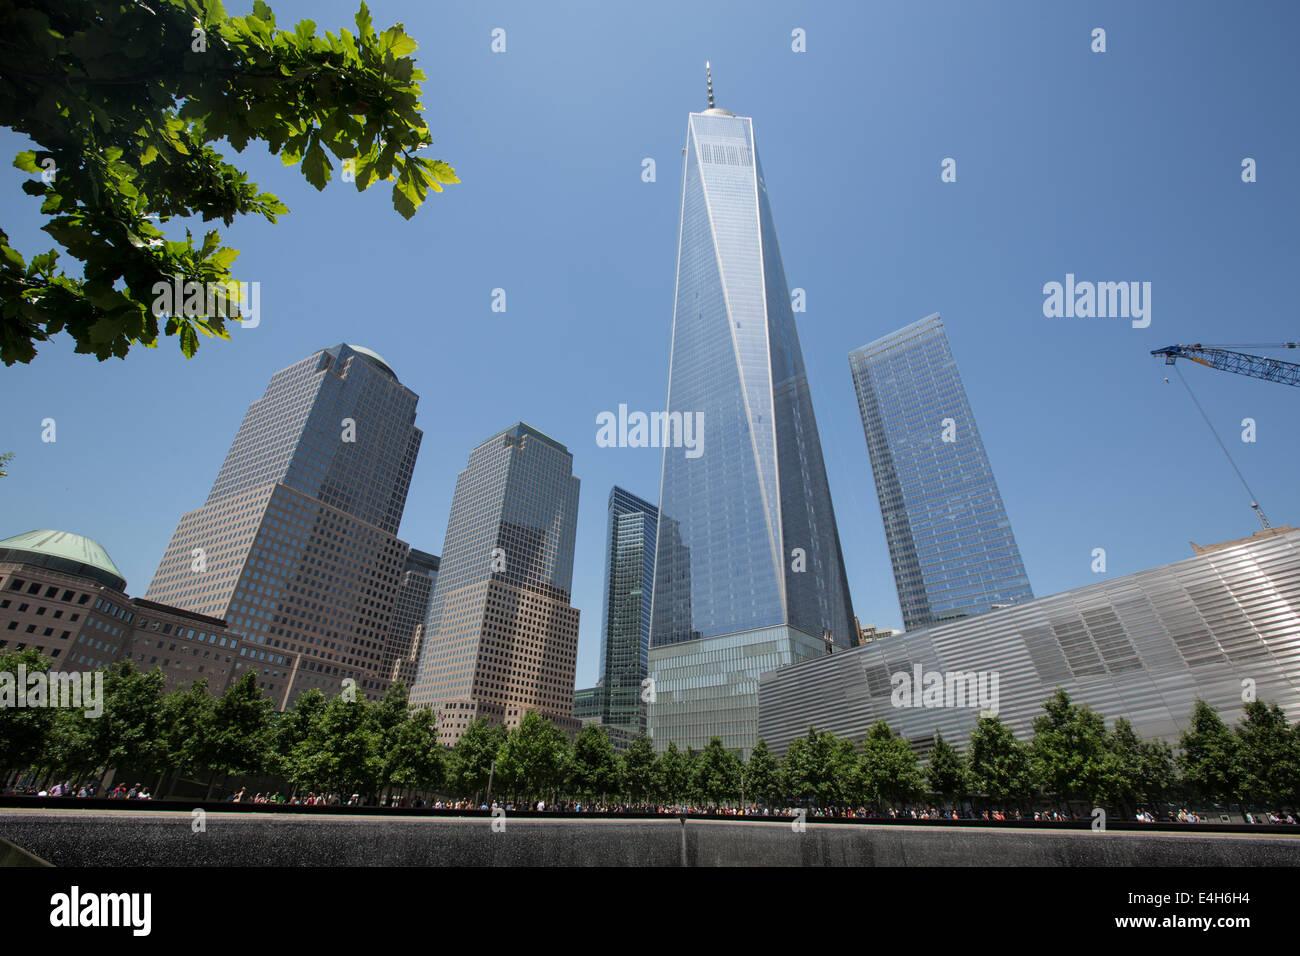 Ground Zero World Trade Centre 9-11 Memorial known as National September 11 Memorial, in Manhattan, New York, America. - Stock Image